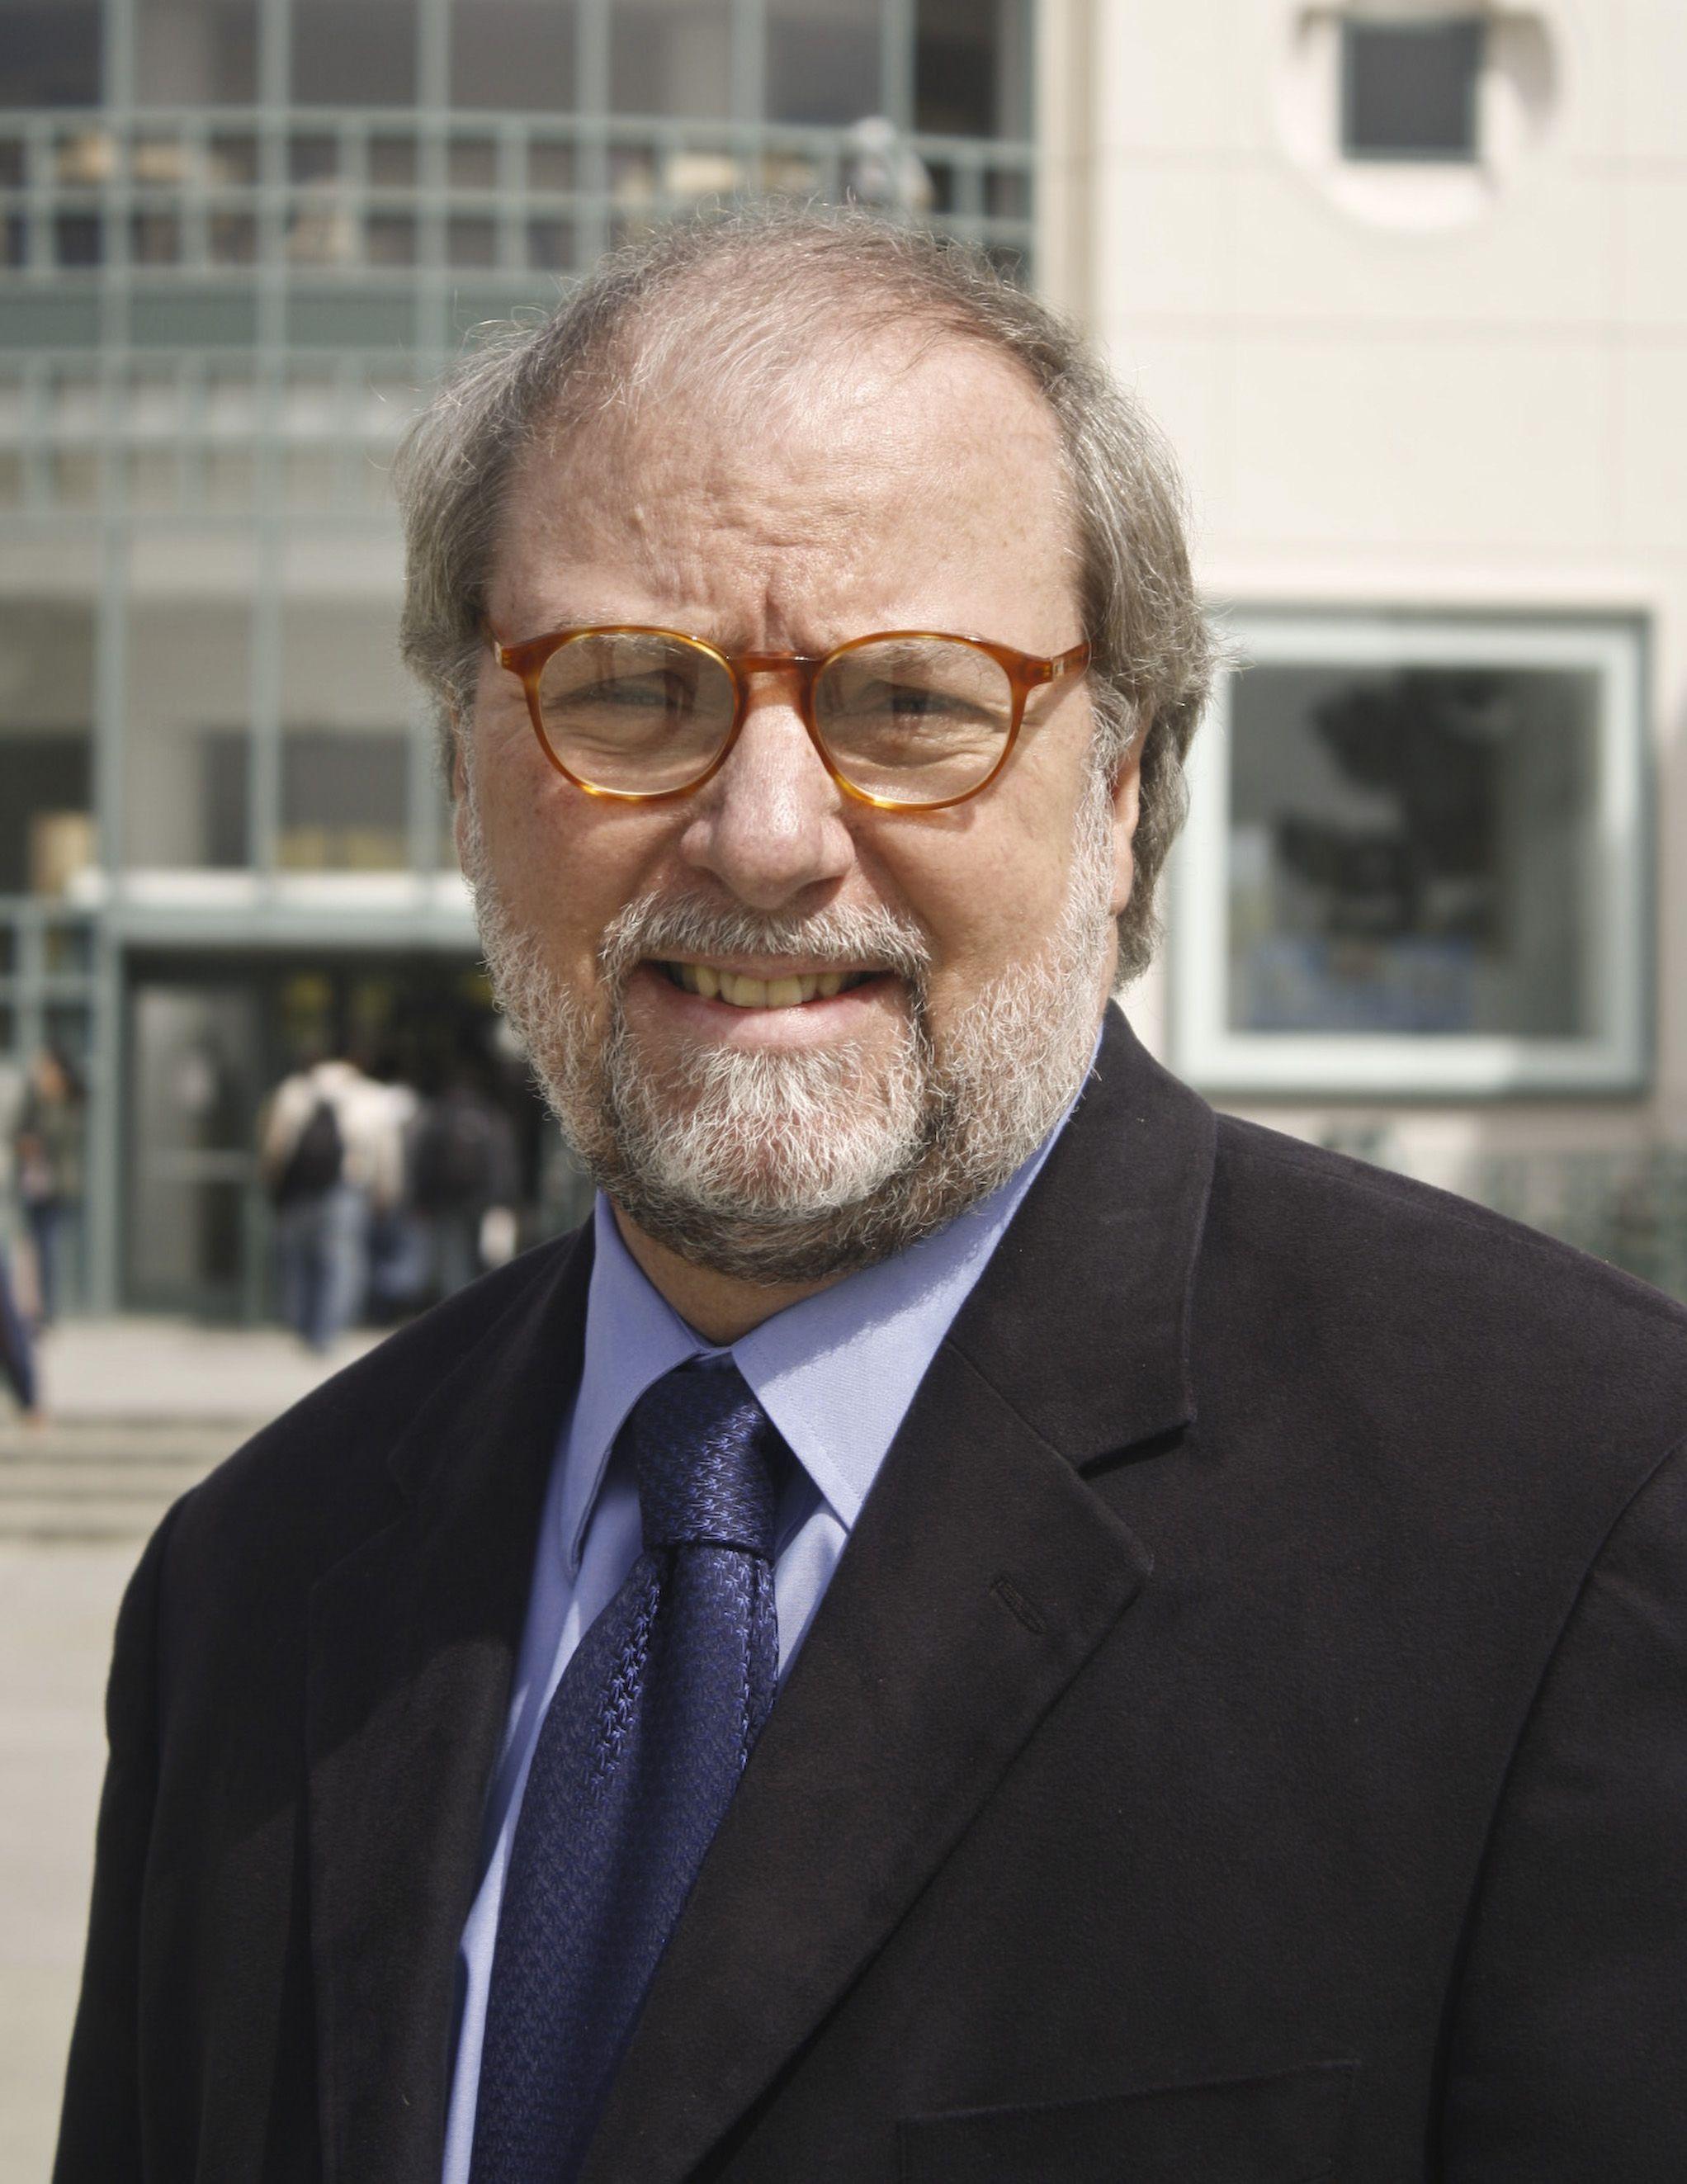 Associate Professor WilliamR. Foster